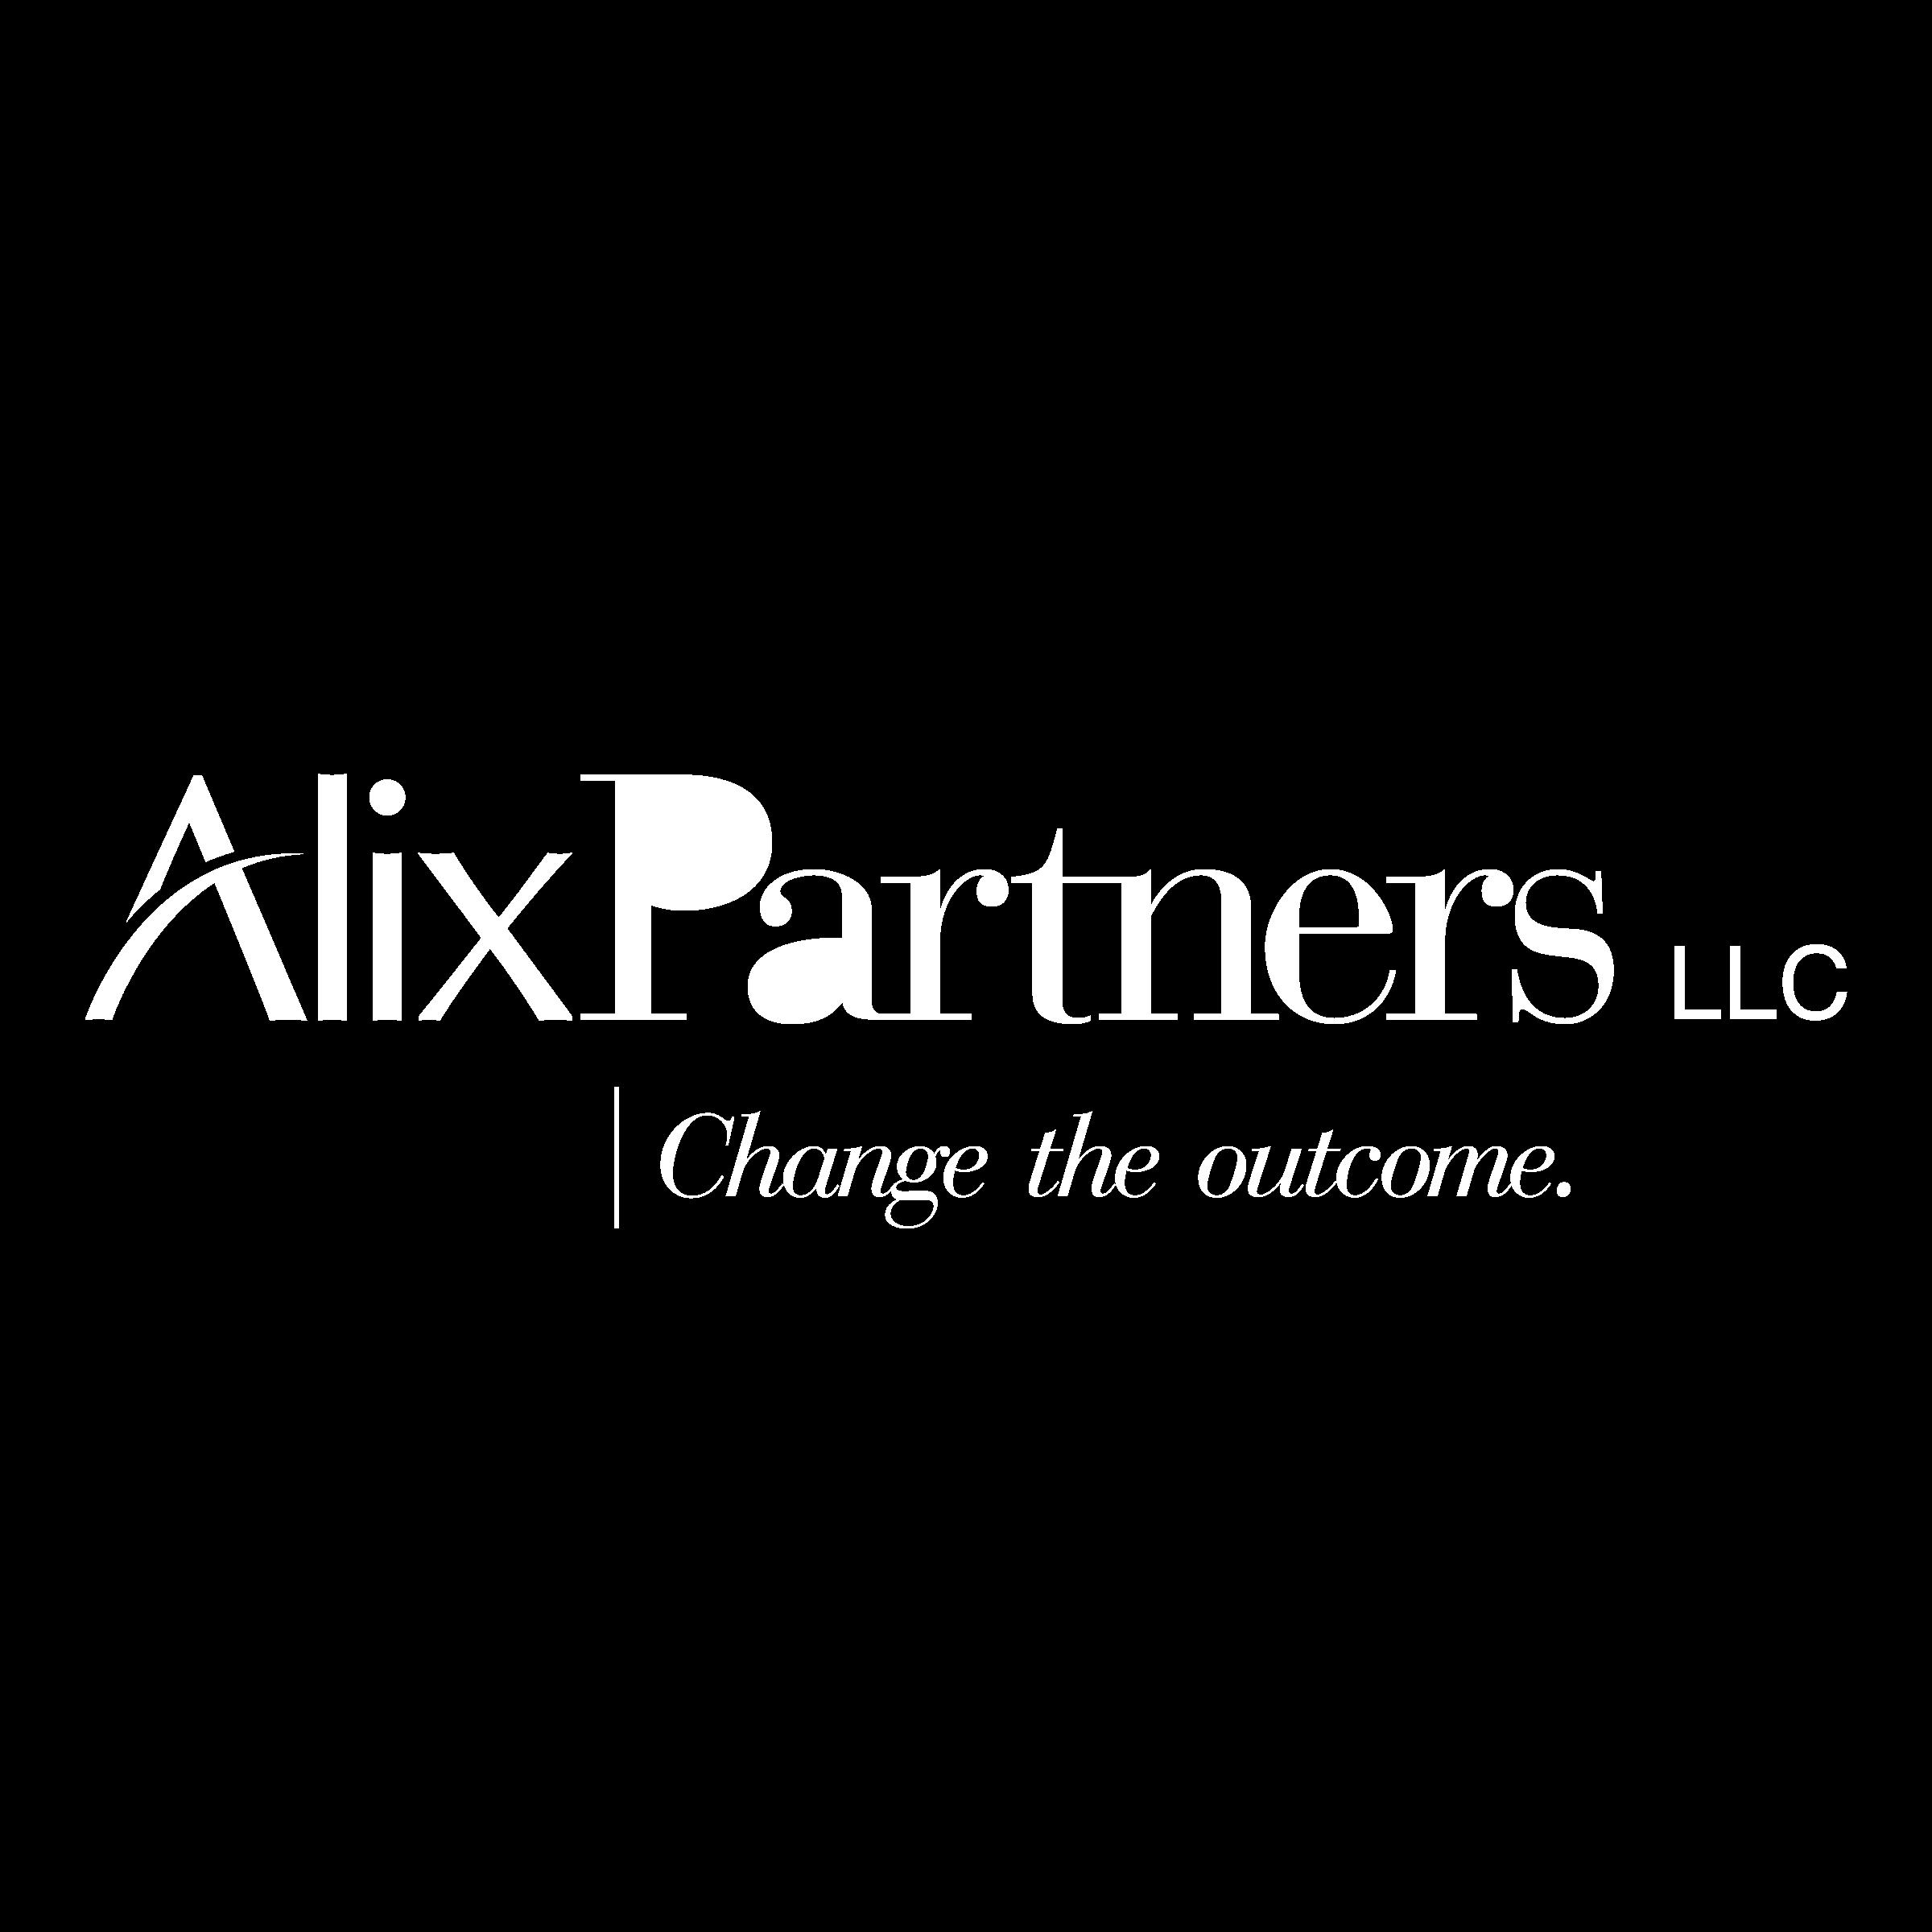 AlixPartners Logo PNG Transparent & SVG Vector - Freebie Supply